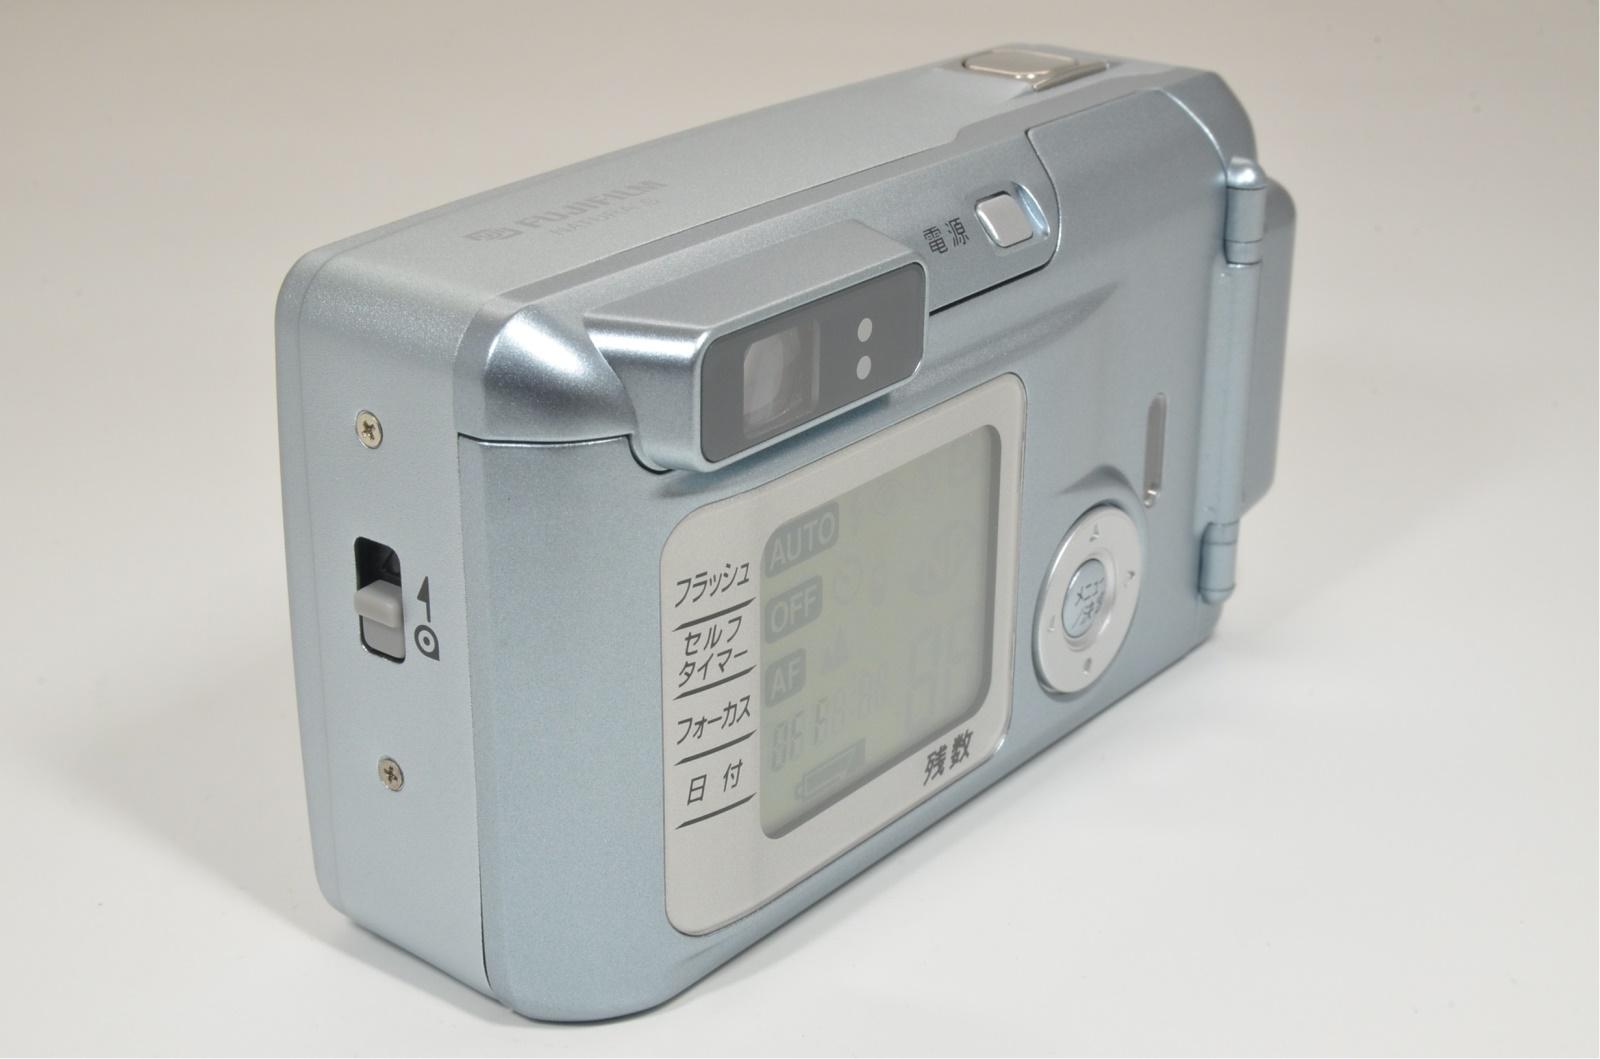 fujifilm natura s aqua film camera fujinon 24mm f1.9 near mint shooting tested